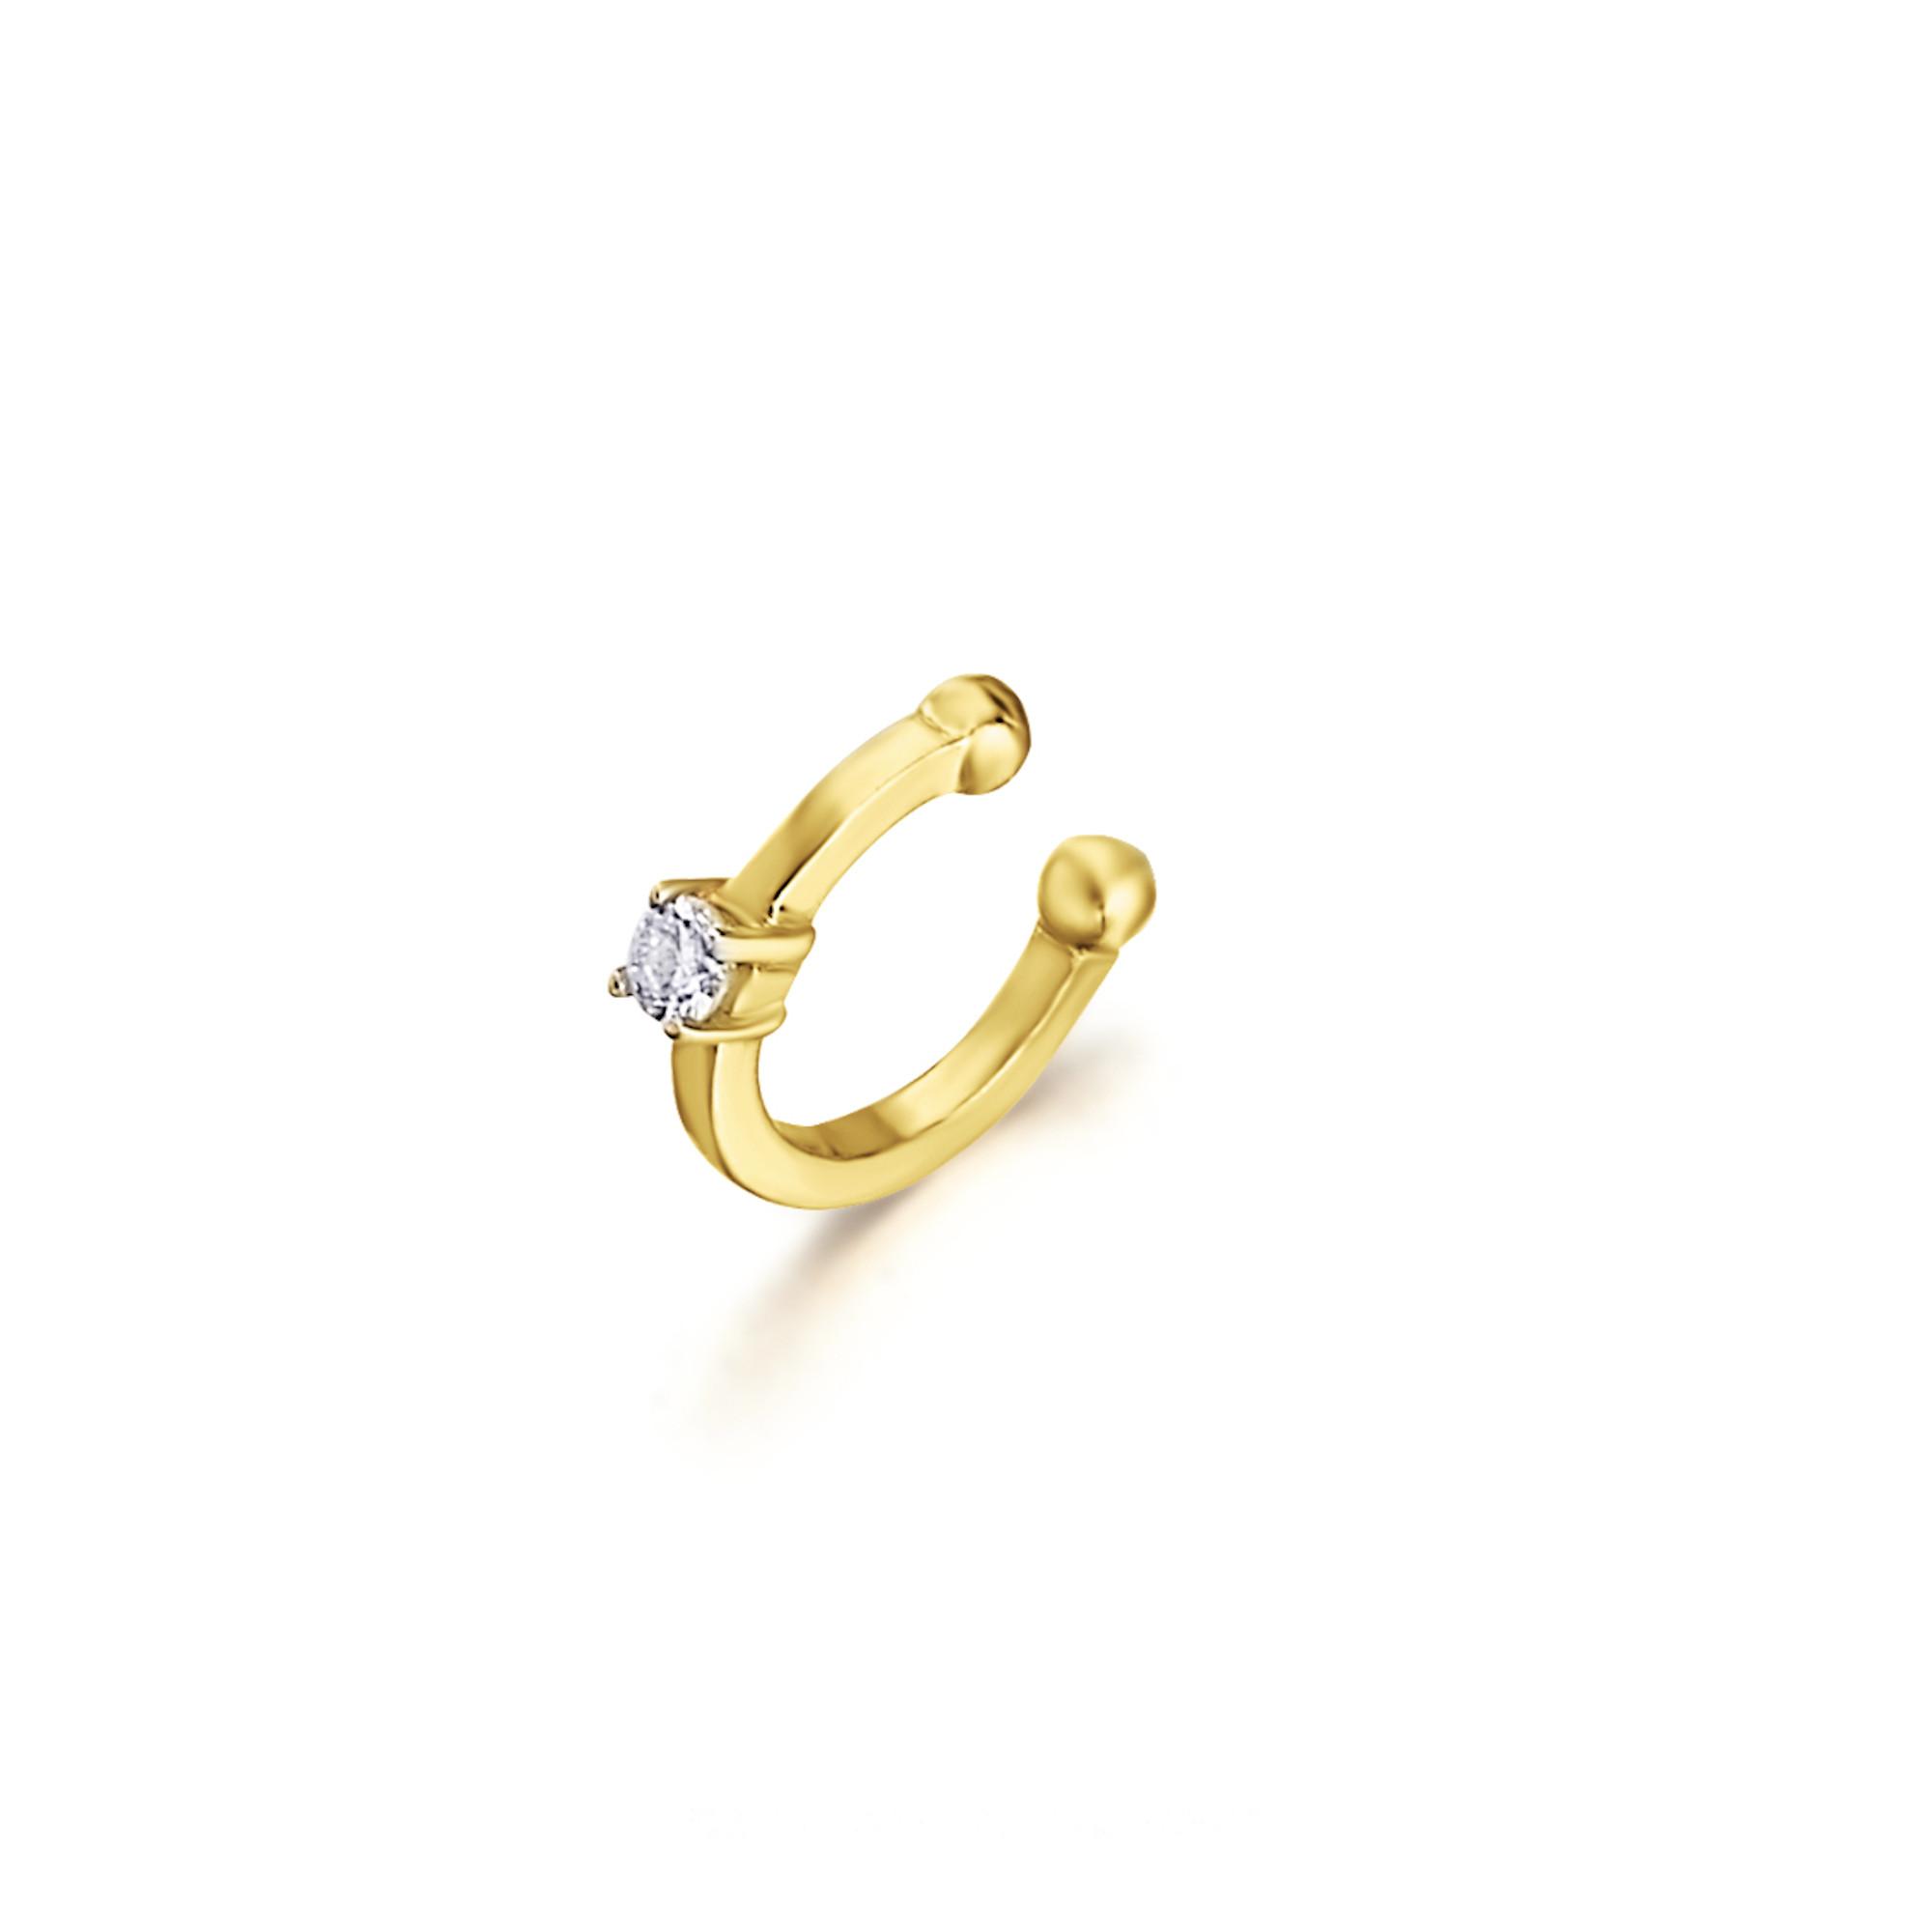 LE CARRÈ helix mono orecchino oro giallo diamante solitario diamond gold sconto discount